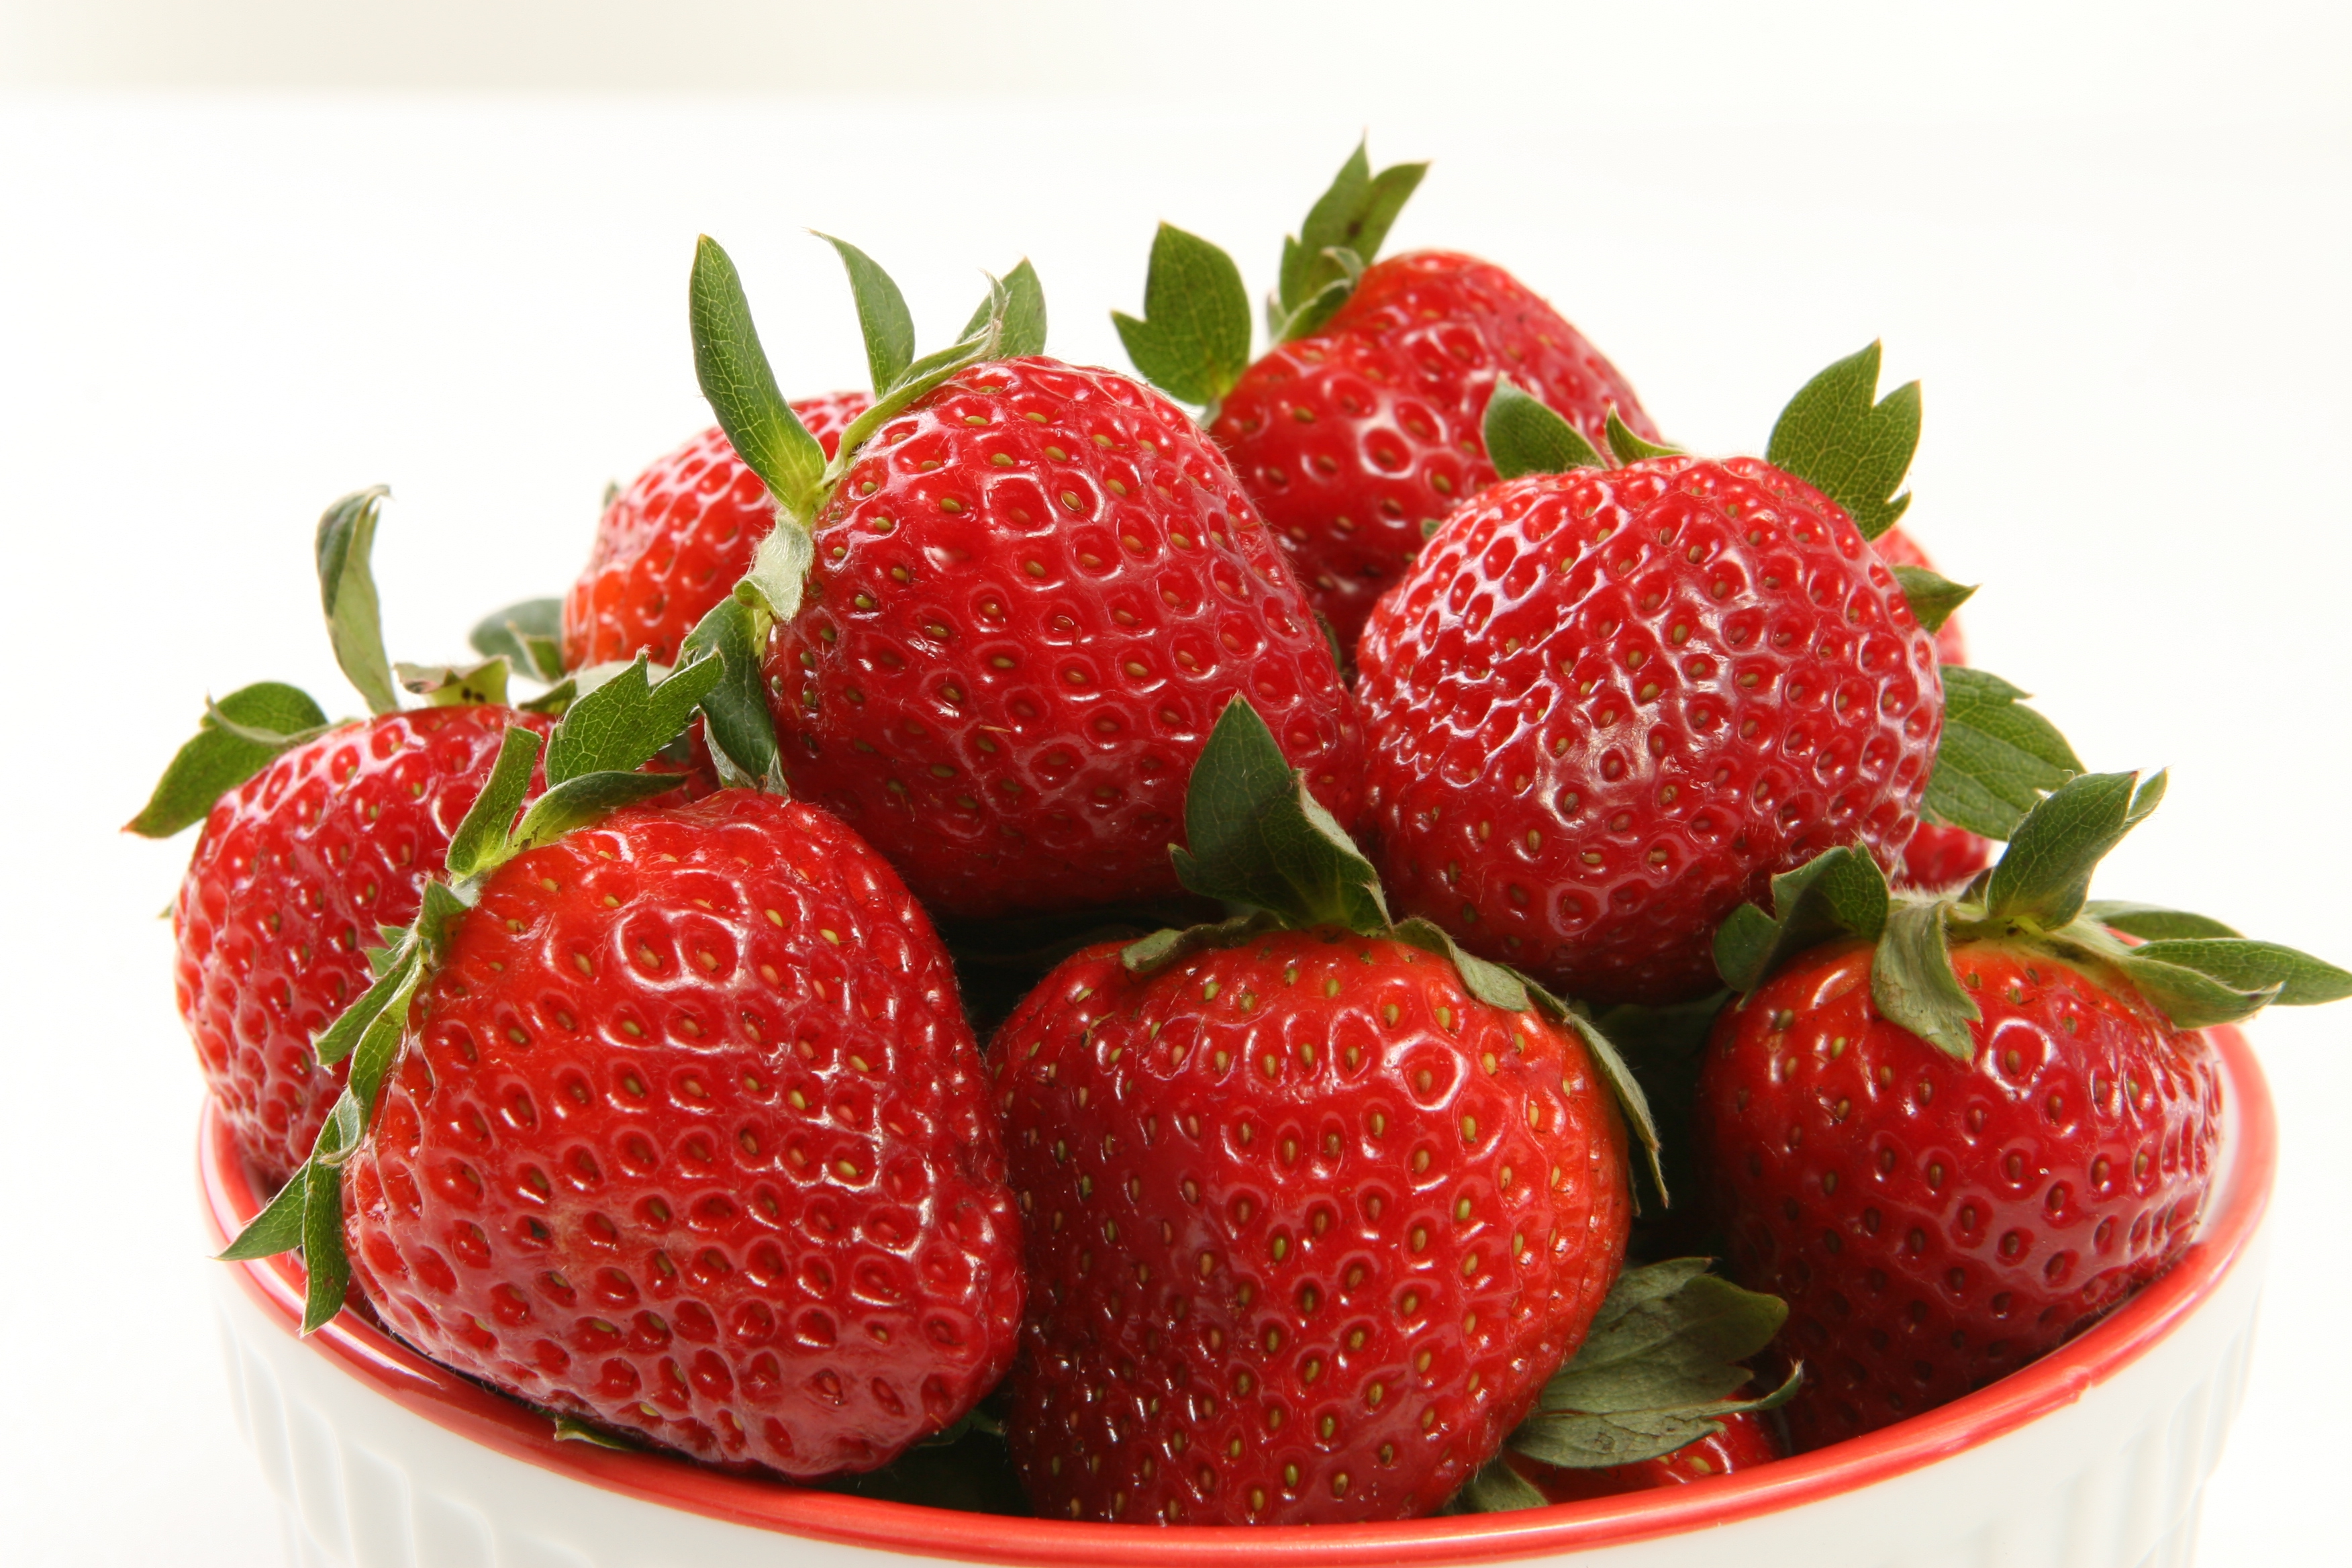 Strawberry Widescreen